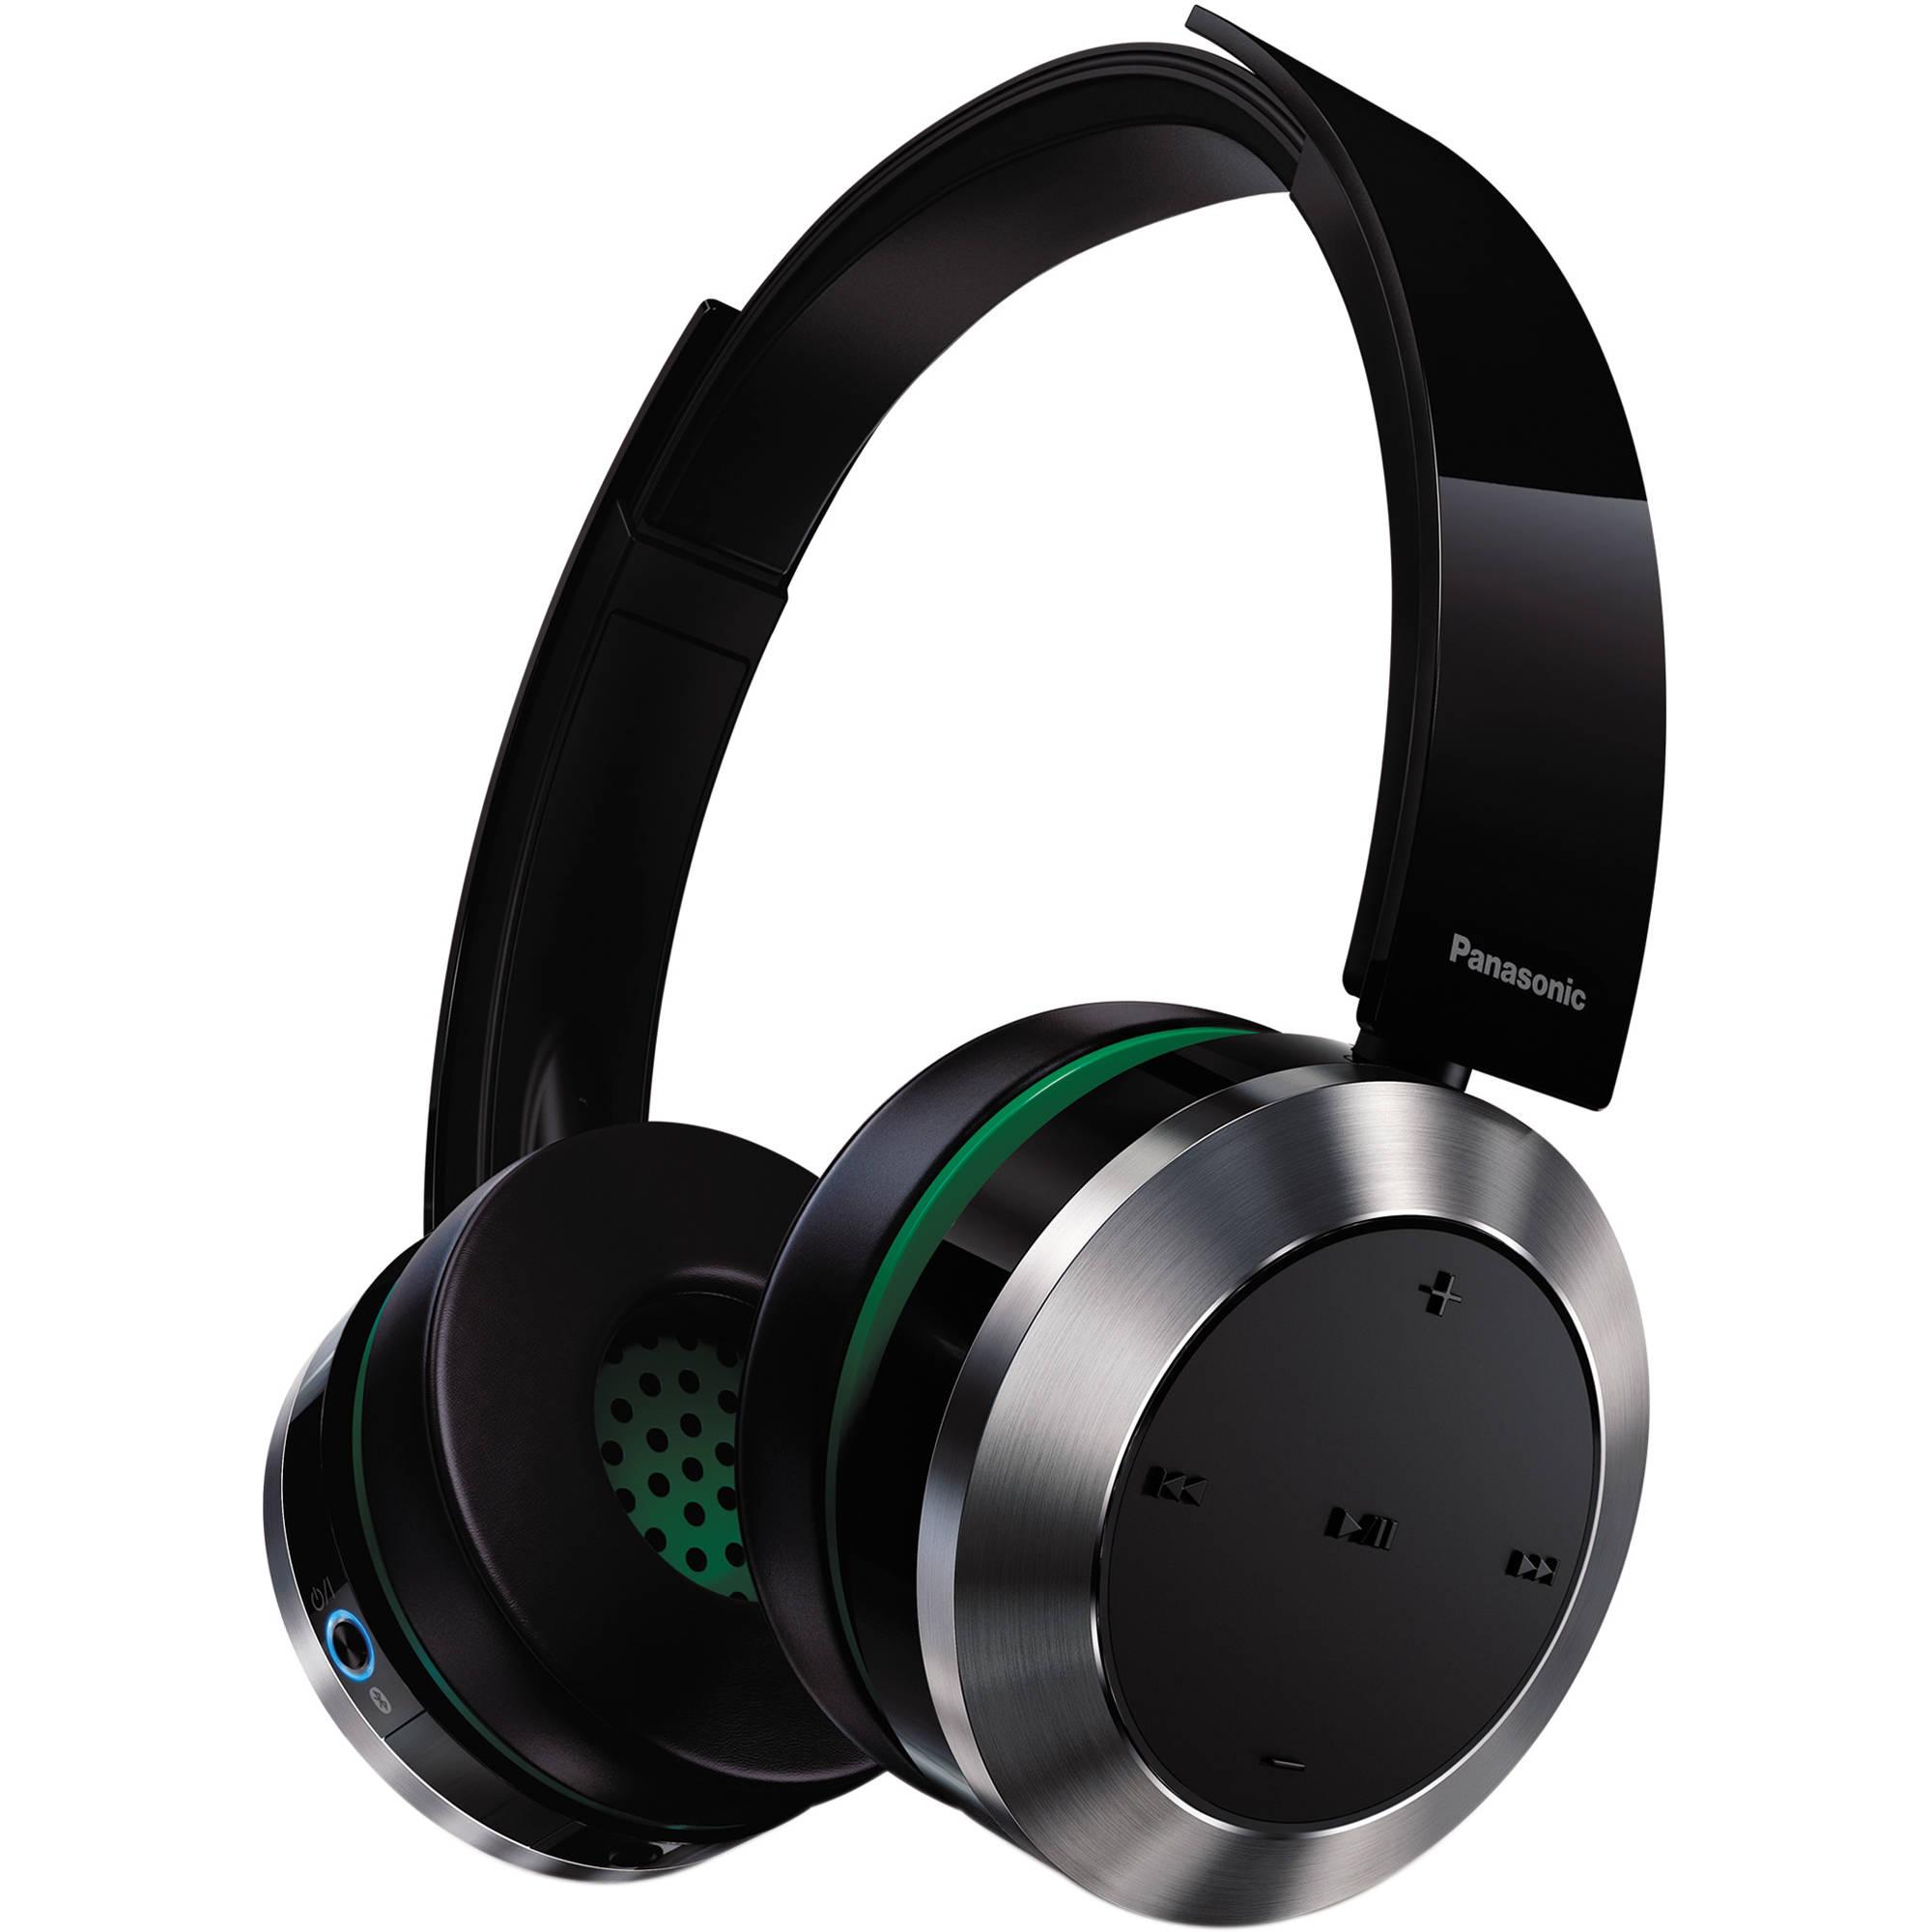 Earbuds wireless headset - earbuds wireless panasonic